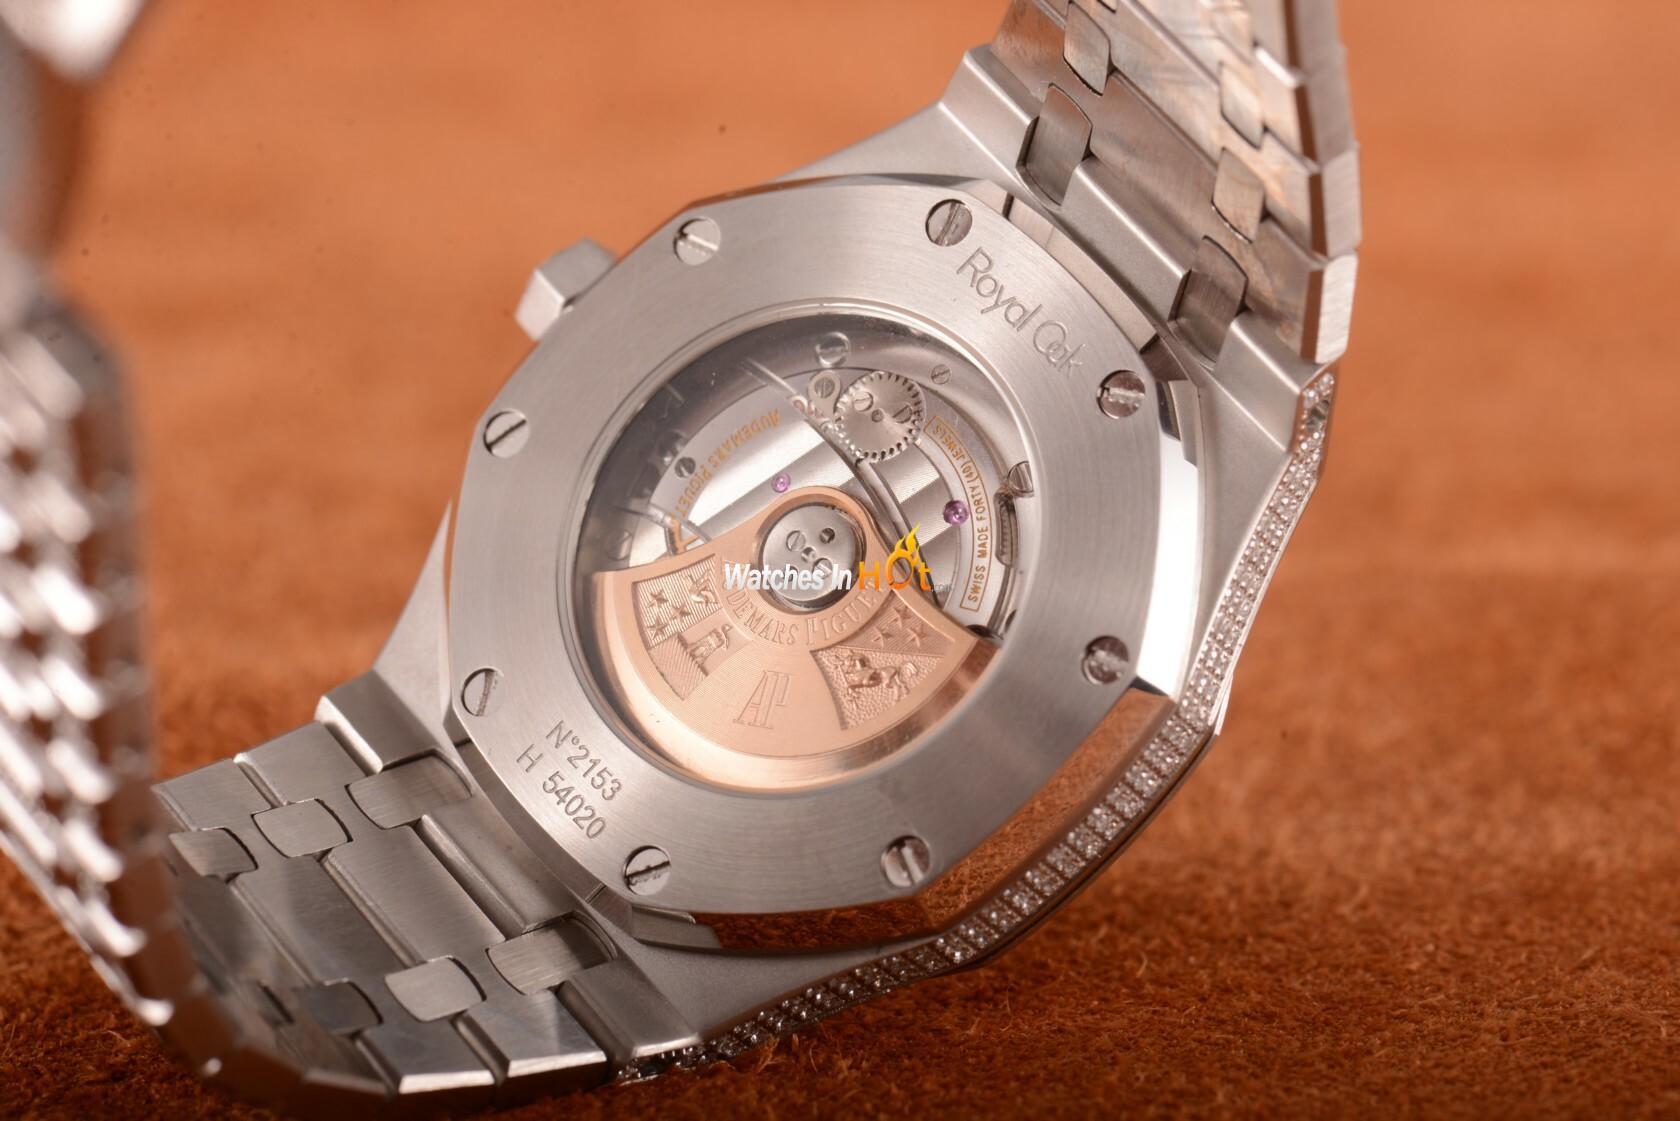 New audemars piguet royal oak 15400 diamond replica watch review replica watches reviews for Replica watches